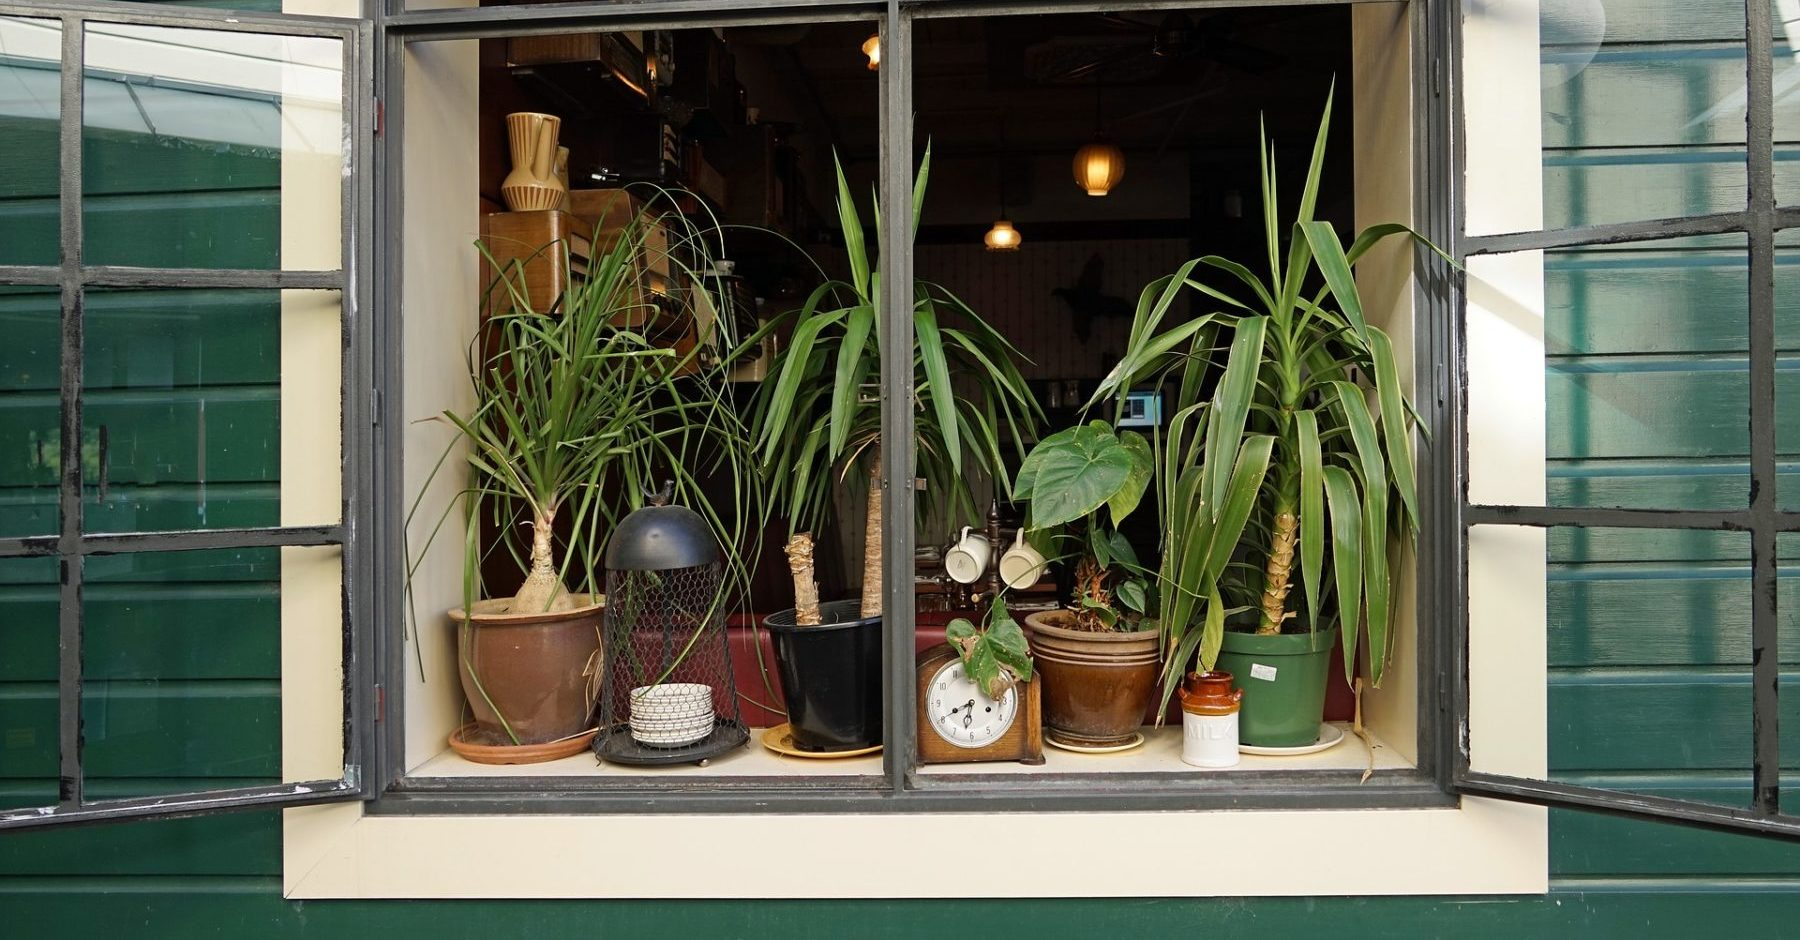 so d ngst du deine zimmerpflanzen richtig. Black Bedroom Furniture Sets. Home Design Ideas